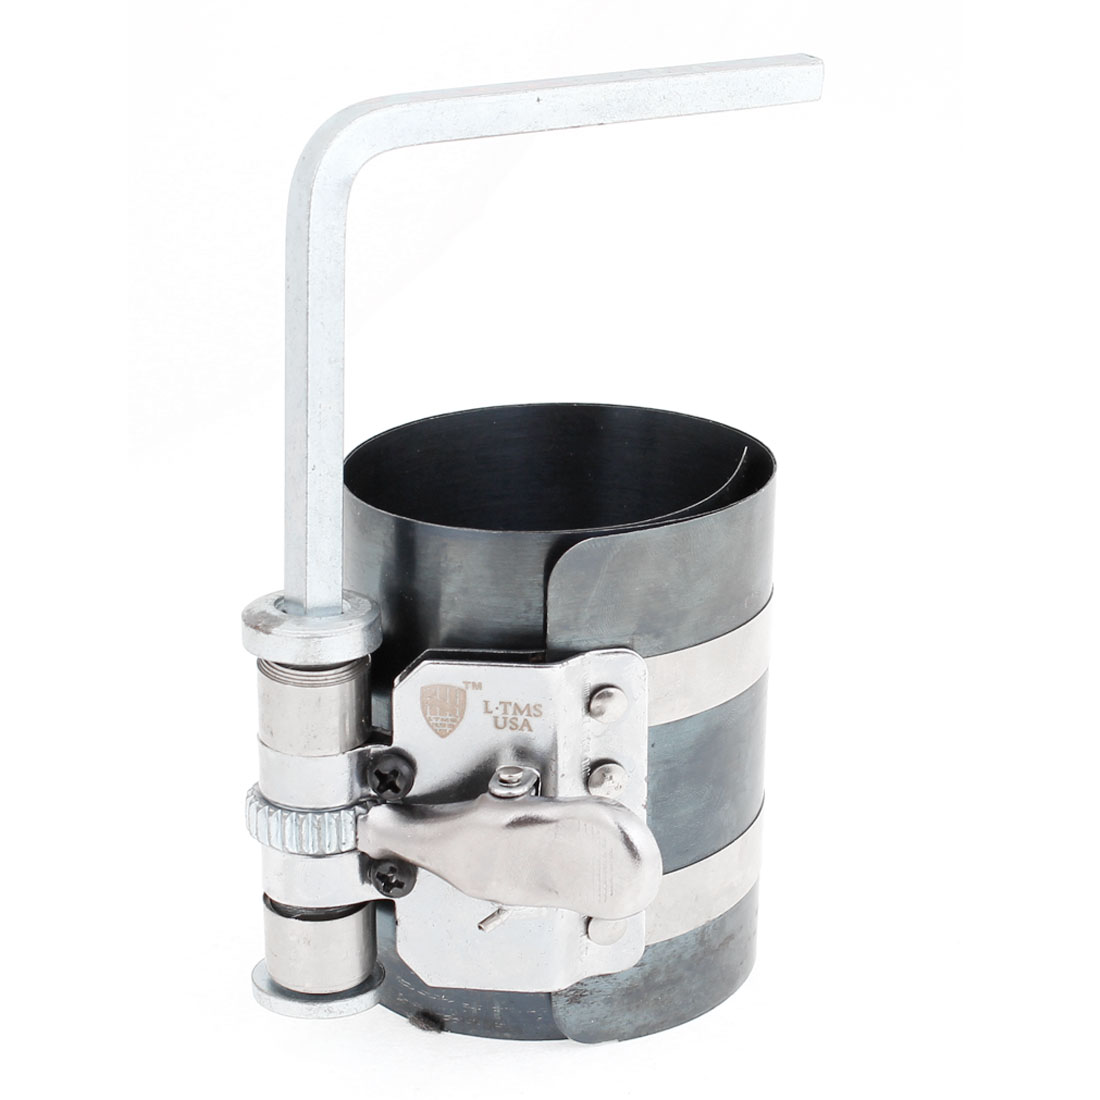 Unique Bargains Replaceable Metal Piston Ring Compressor 53mm-125mm Capacity for Car Auto